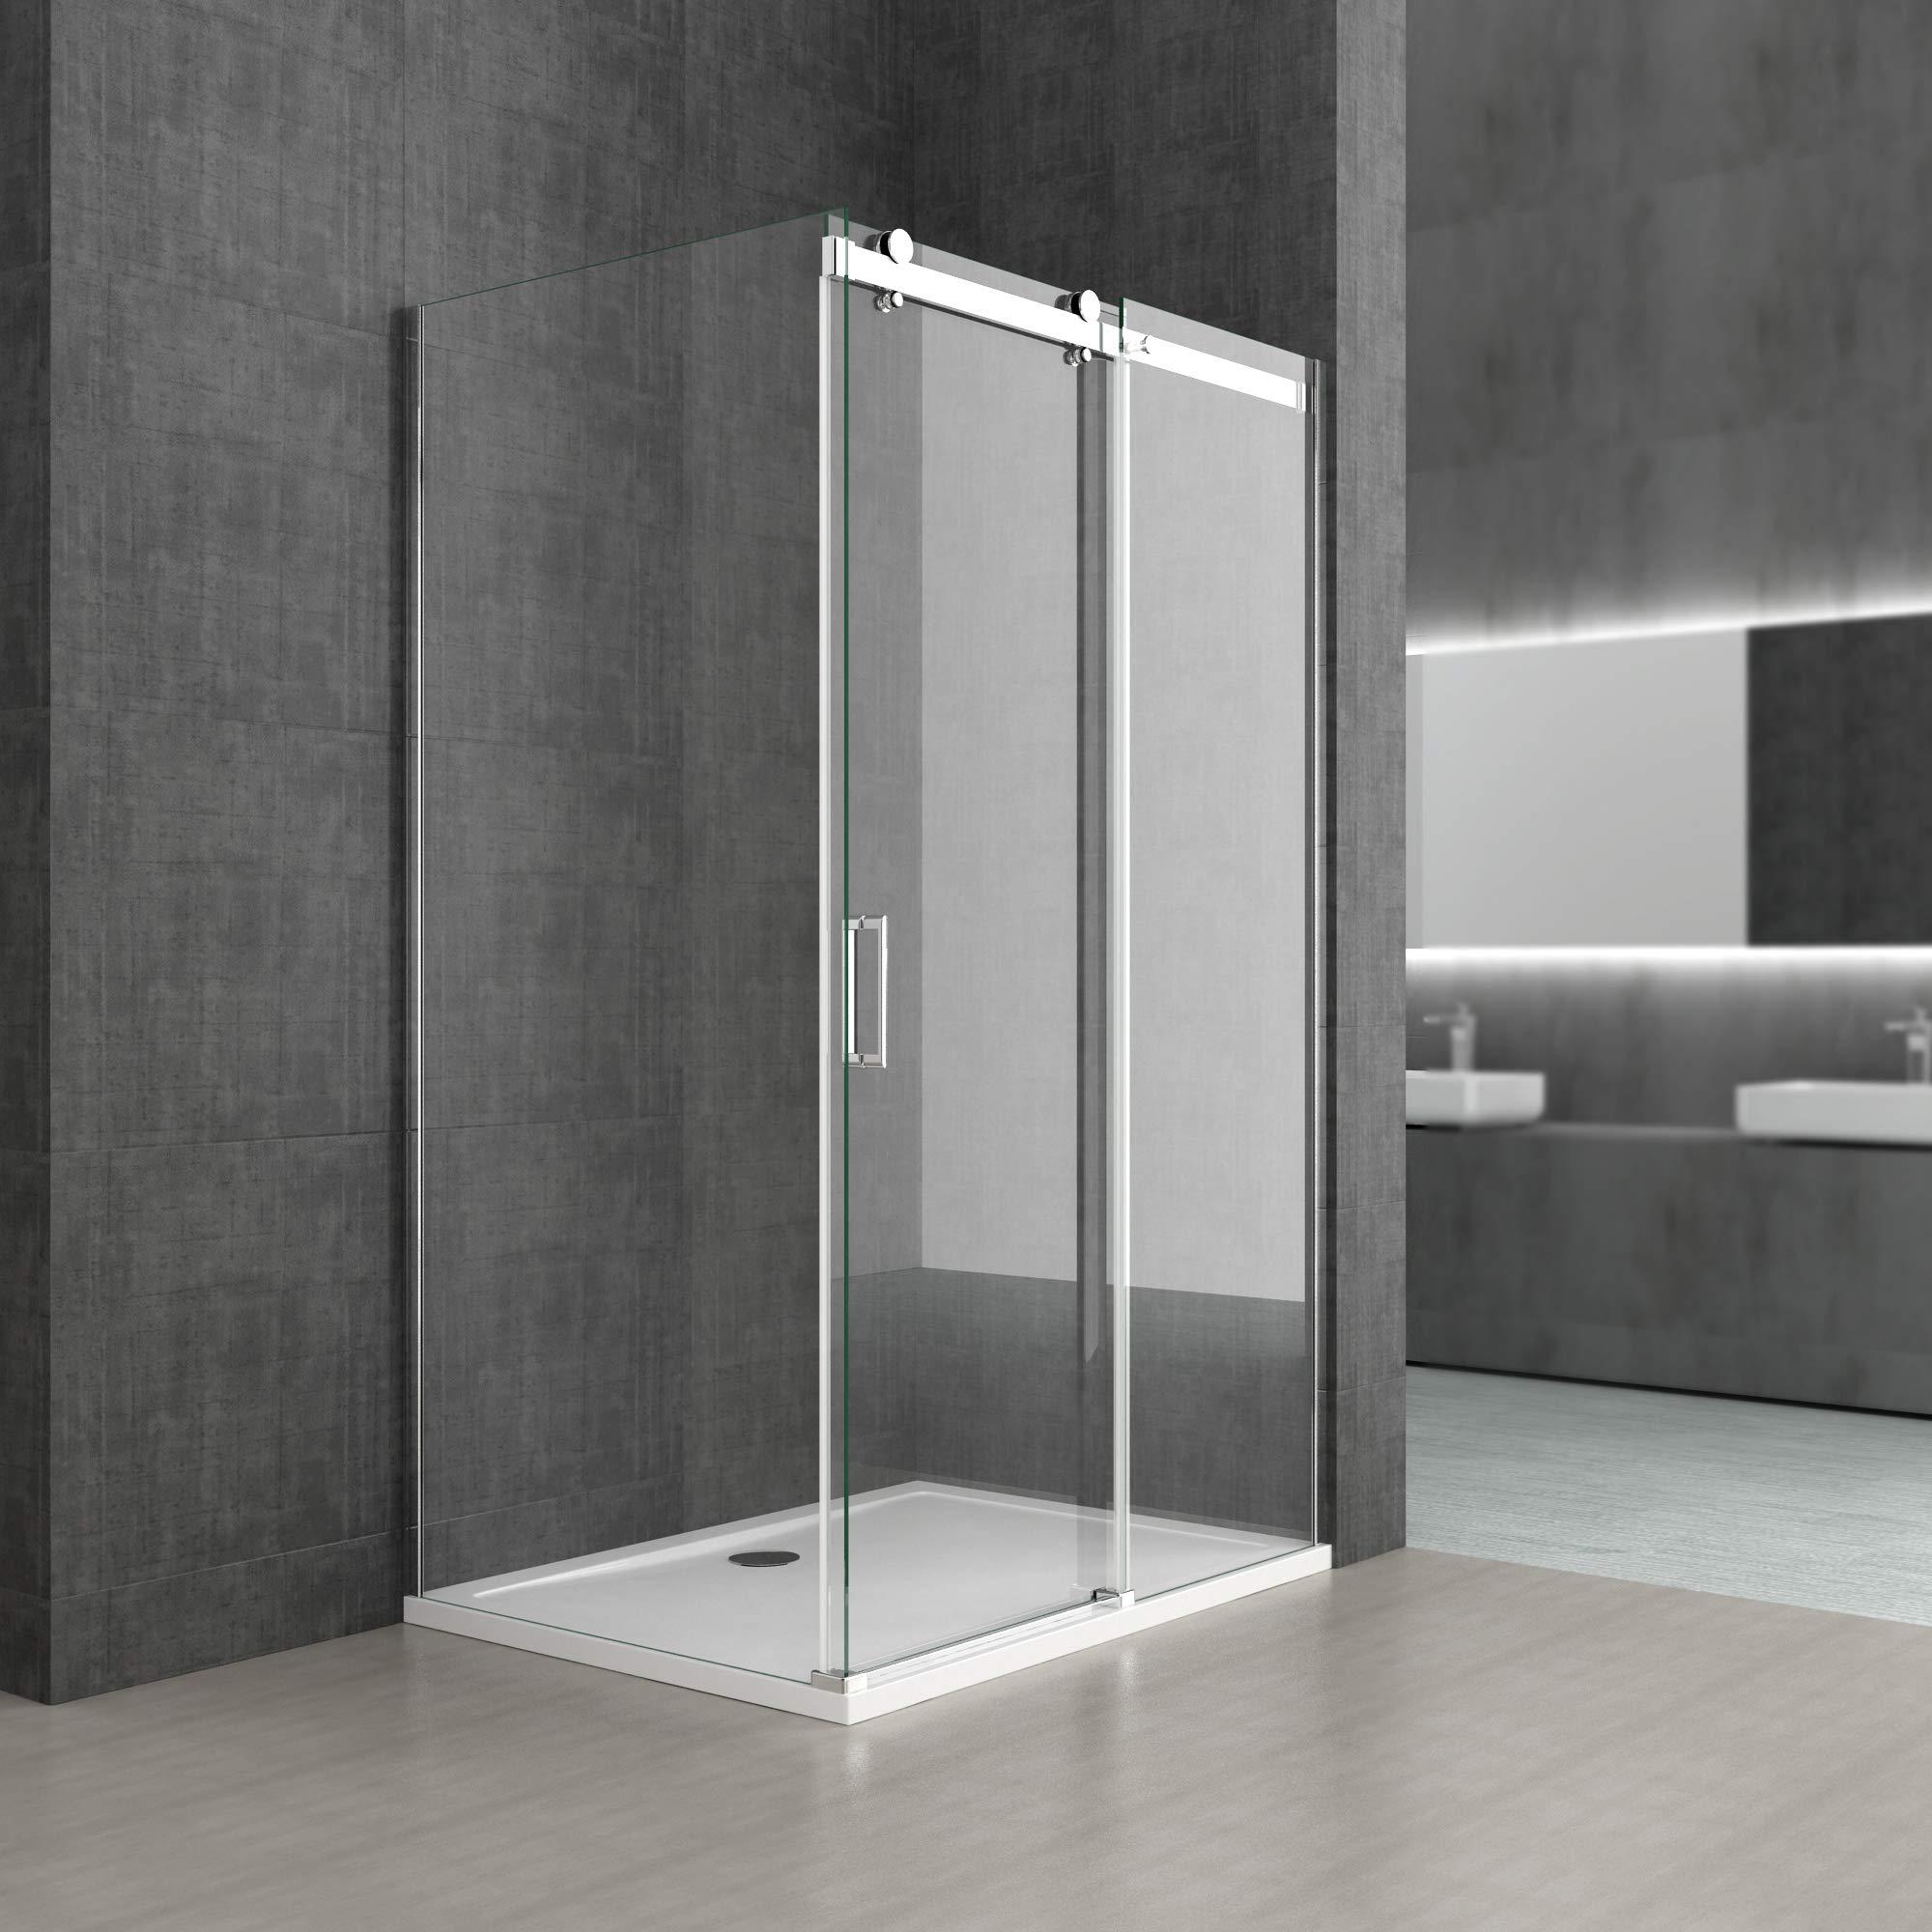 Sogood: Cabina de ducha diseño Ravenna17, 70x100x195cm, mampara de ...